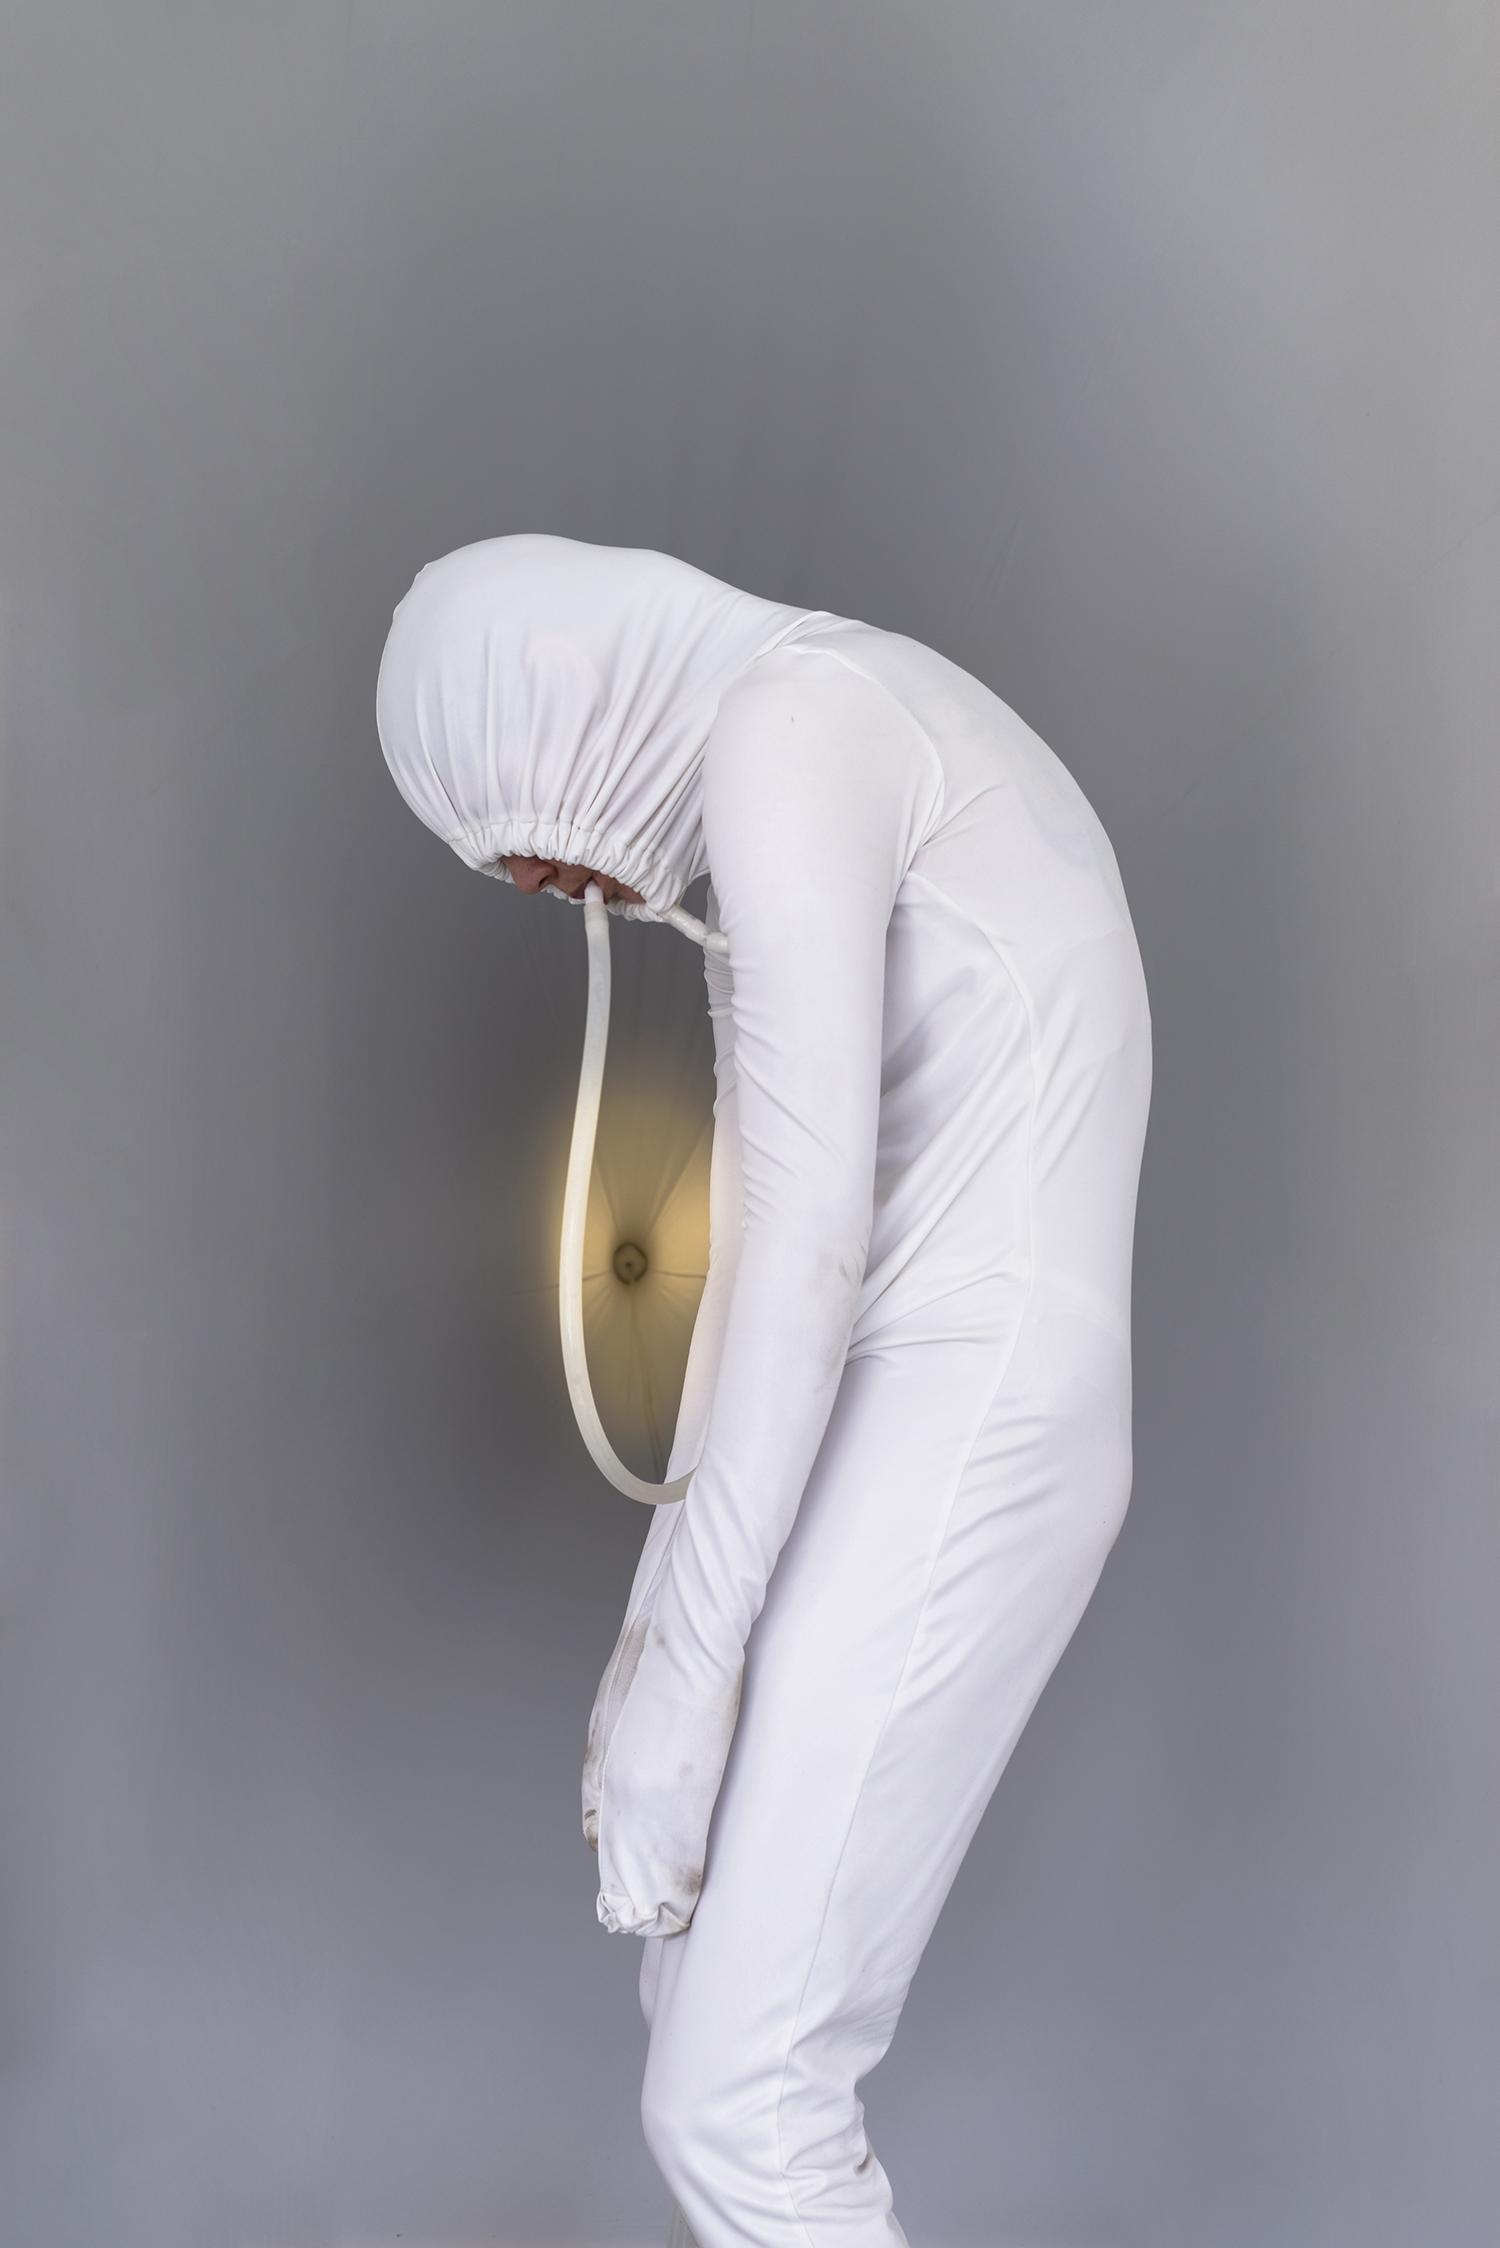 Malin Bulow Mesmerising Performance Art Elastic Bonding 2 Yellowtrace 05